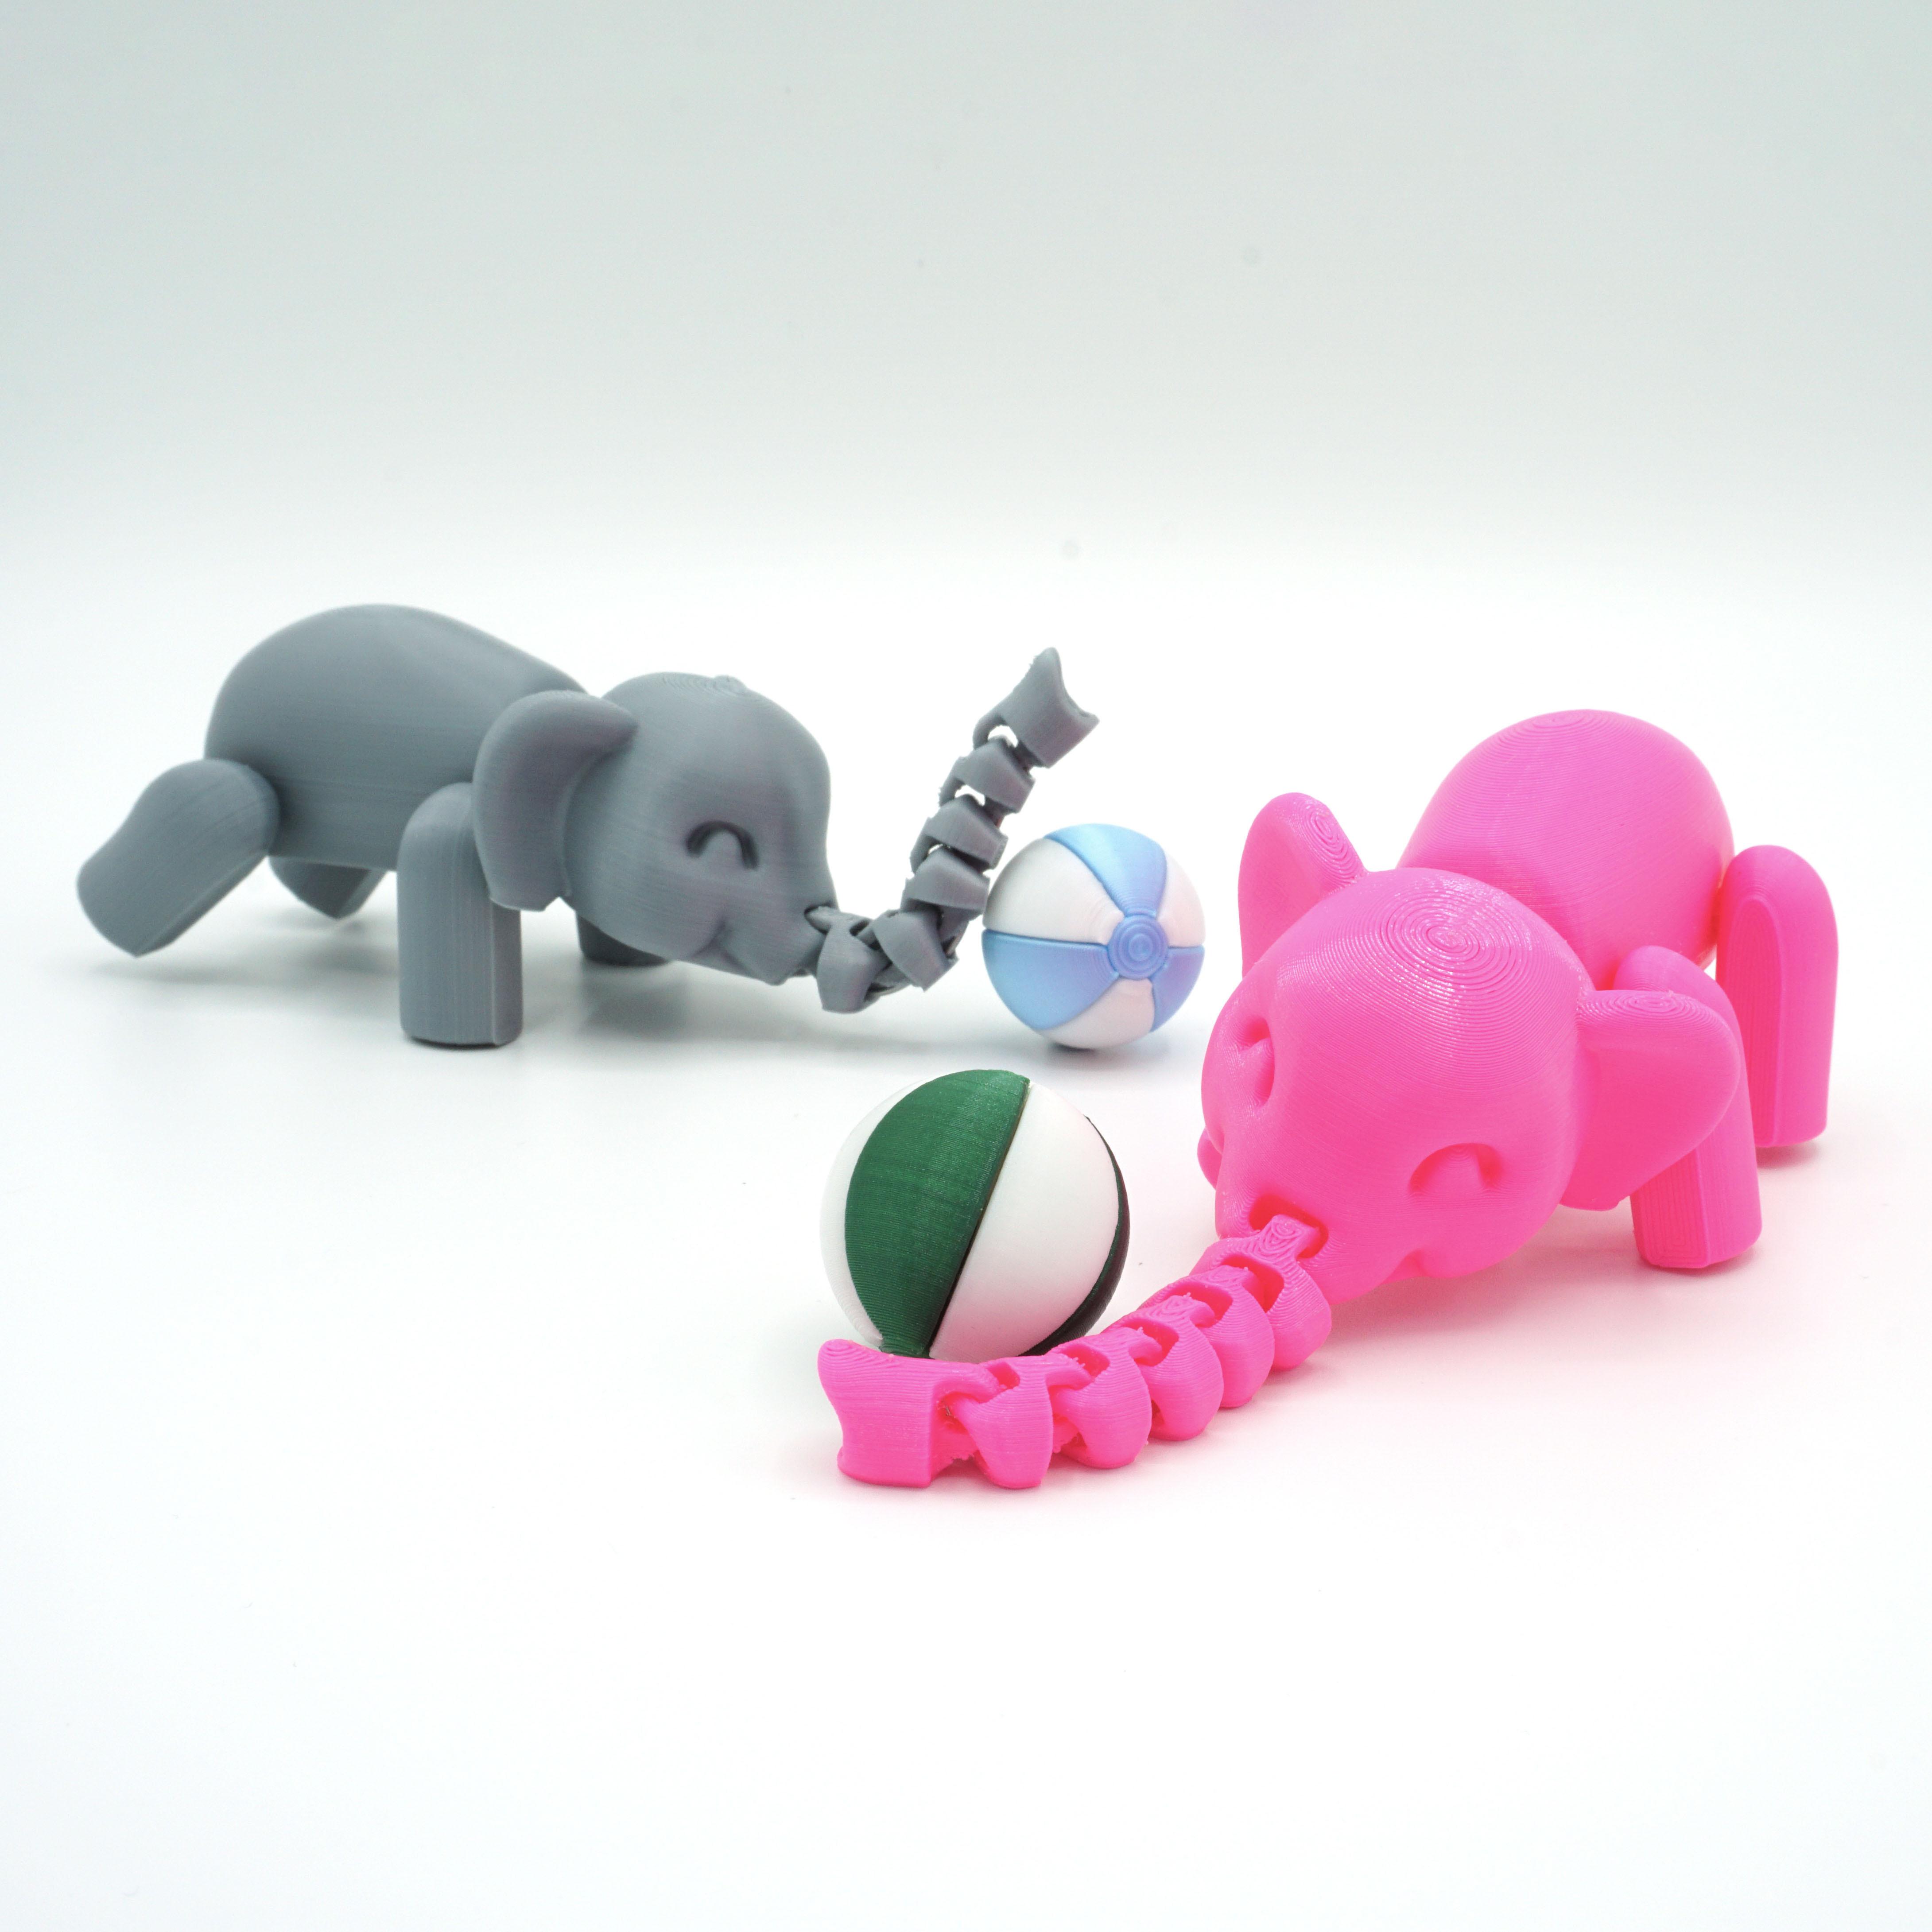 DSC01105 copia.jpg Download STL file Flexiphant • 3D printable model, mcgybeer